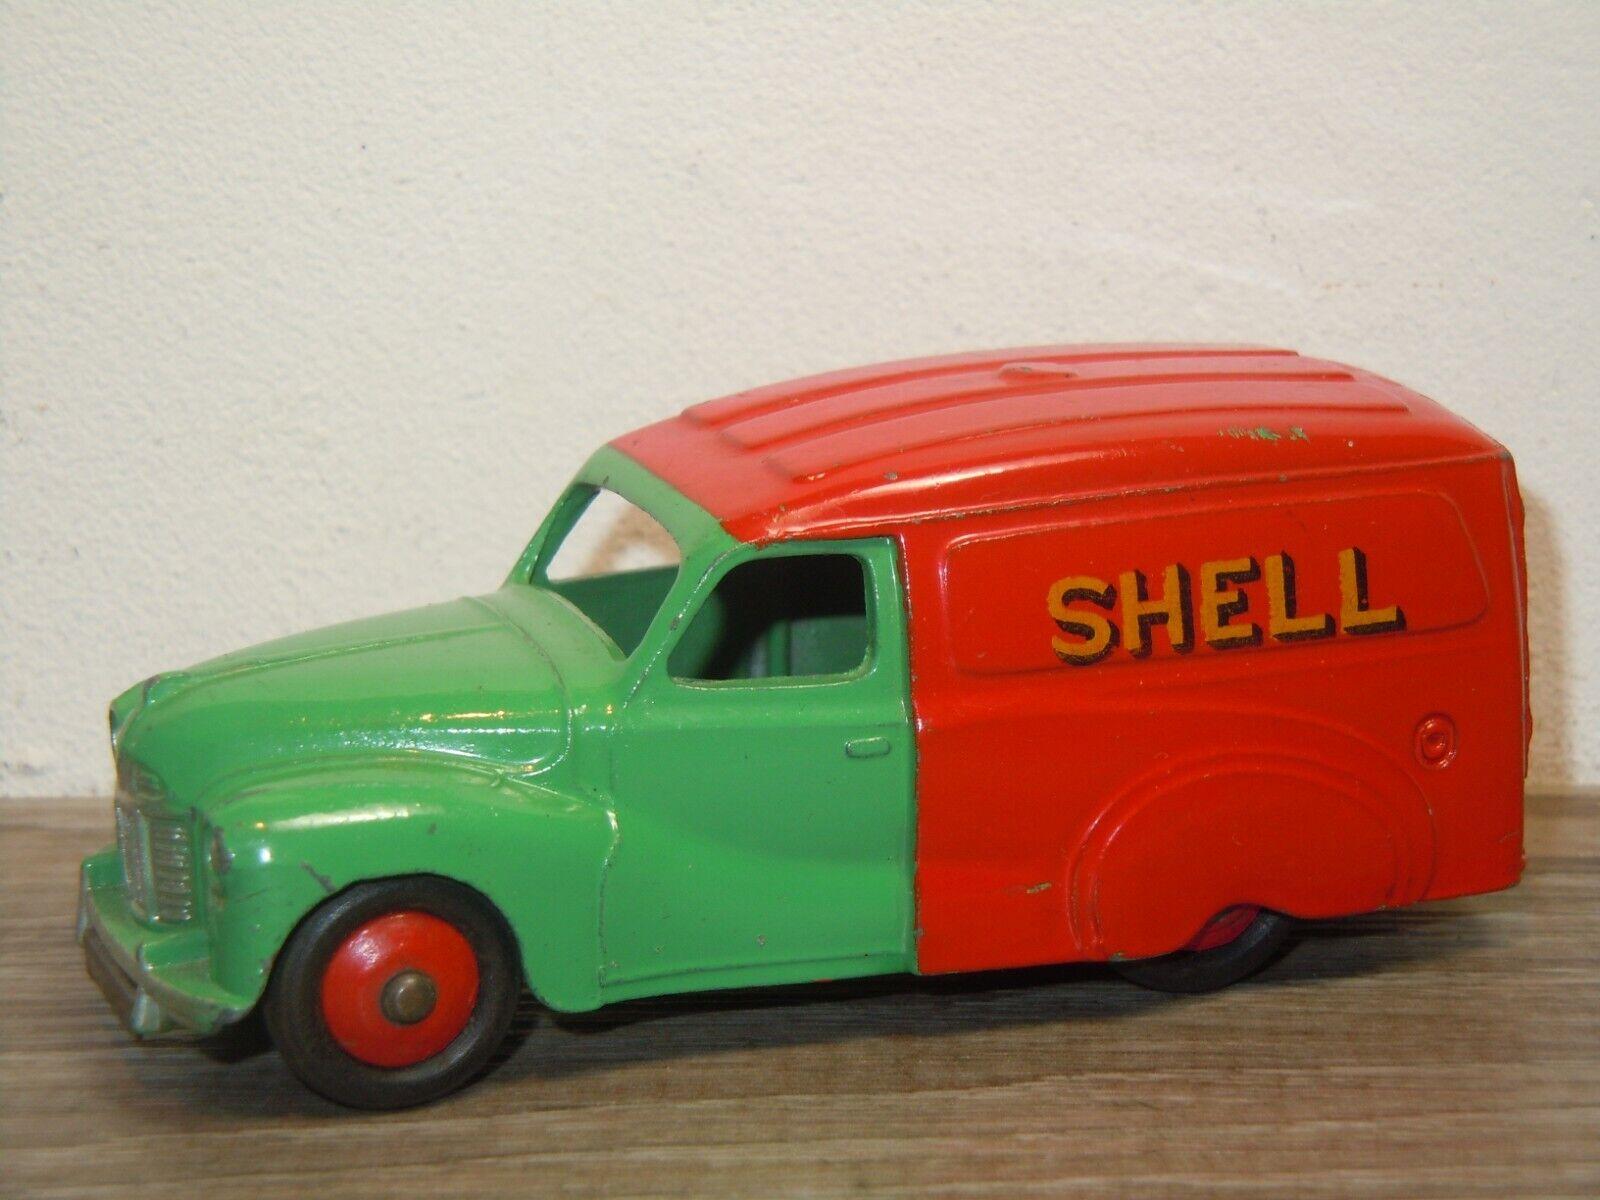 Austin Van BP SHELL - Dinky Toys 470 England 37661